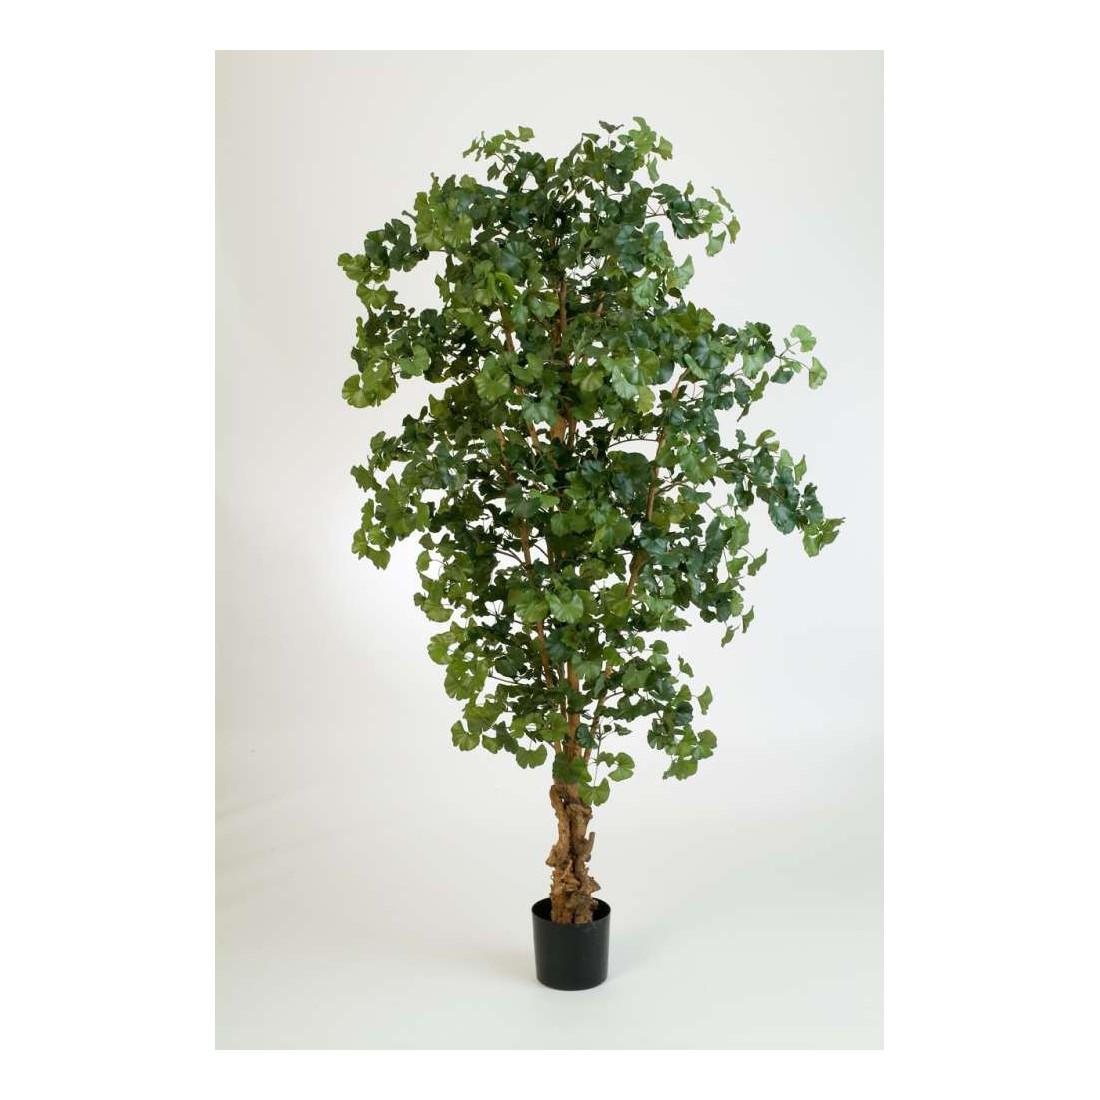 ginkgo artificiel foret arbre autres arbres autres arbres artificiels artificielles reflets. Black Bedroom Furniture Sets. Home Design Ideas